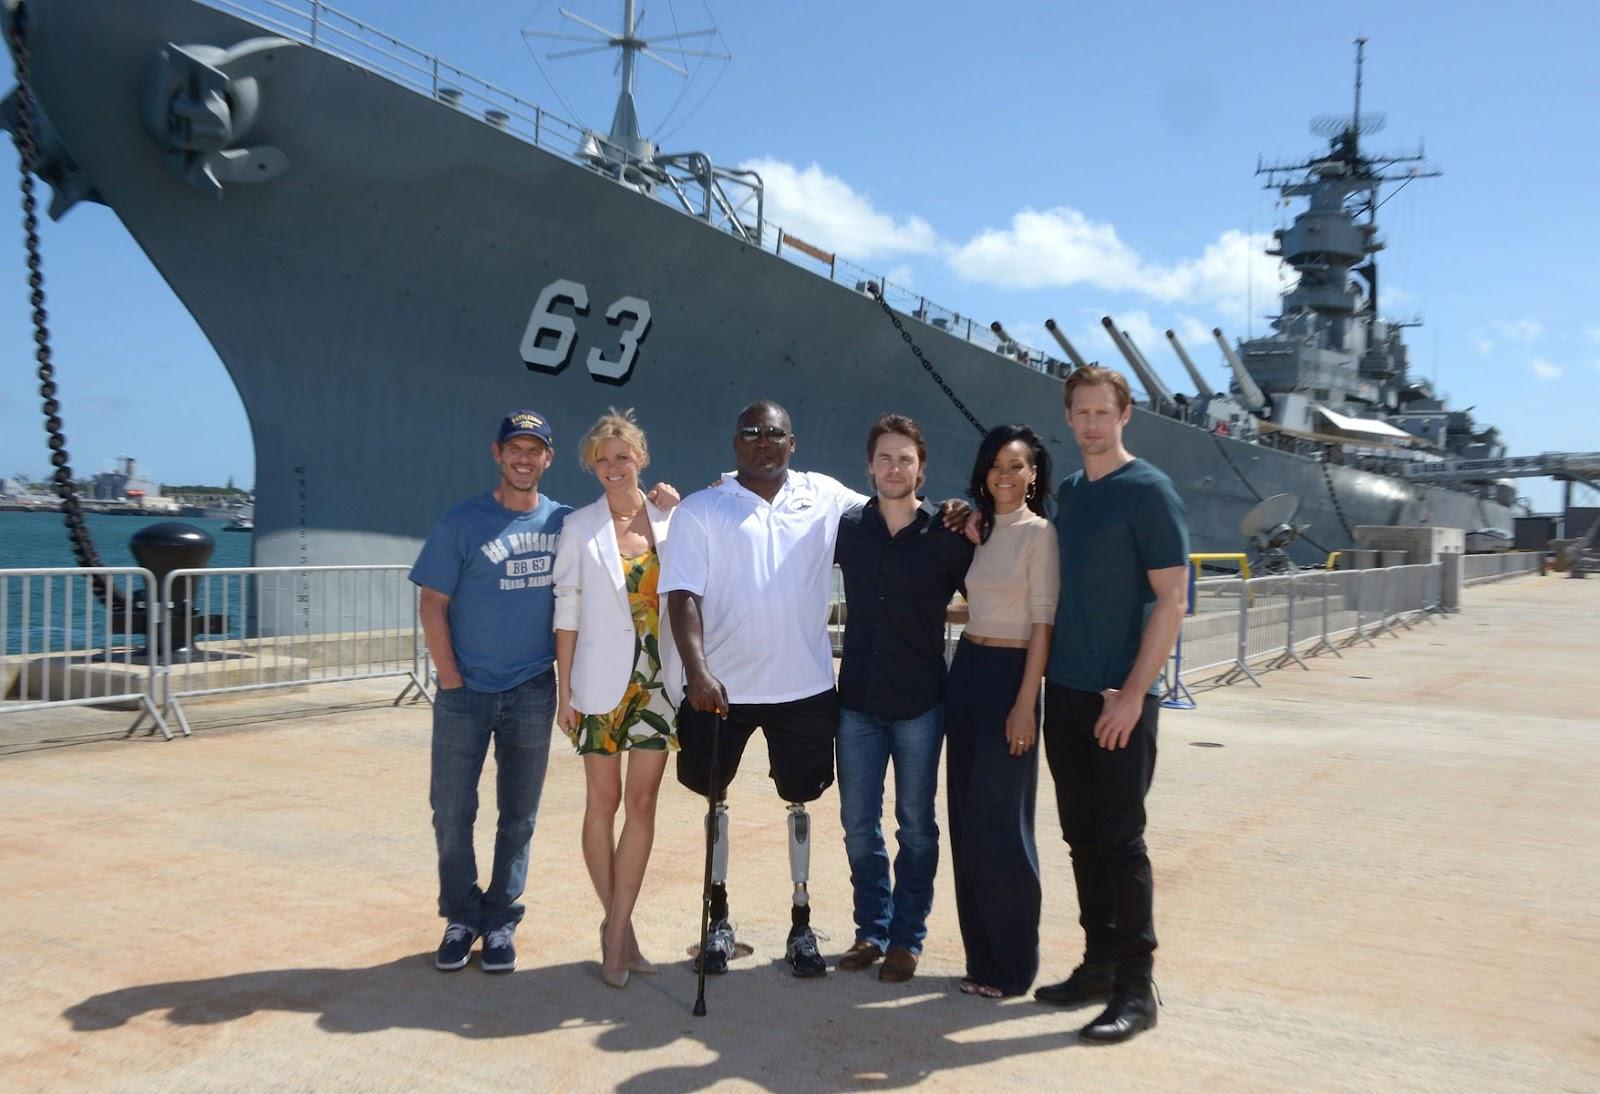 http://3.bp.blogspot.com/-jsm4FQRdSMs/T56MI2_Cv8I/AAAAAAAADMo/kjpV2NWOeG8/s1600/RIHANNA-Battleship-Photo-call-at-the-Battleship-Missouri-Memorial-Pearl-Harbor-2012-01.jpg